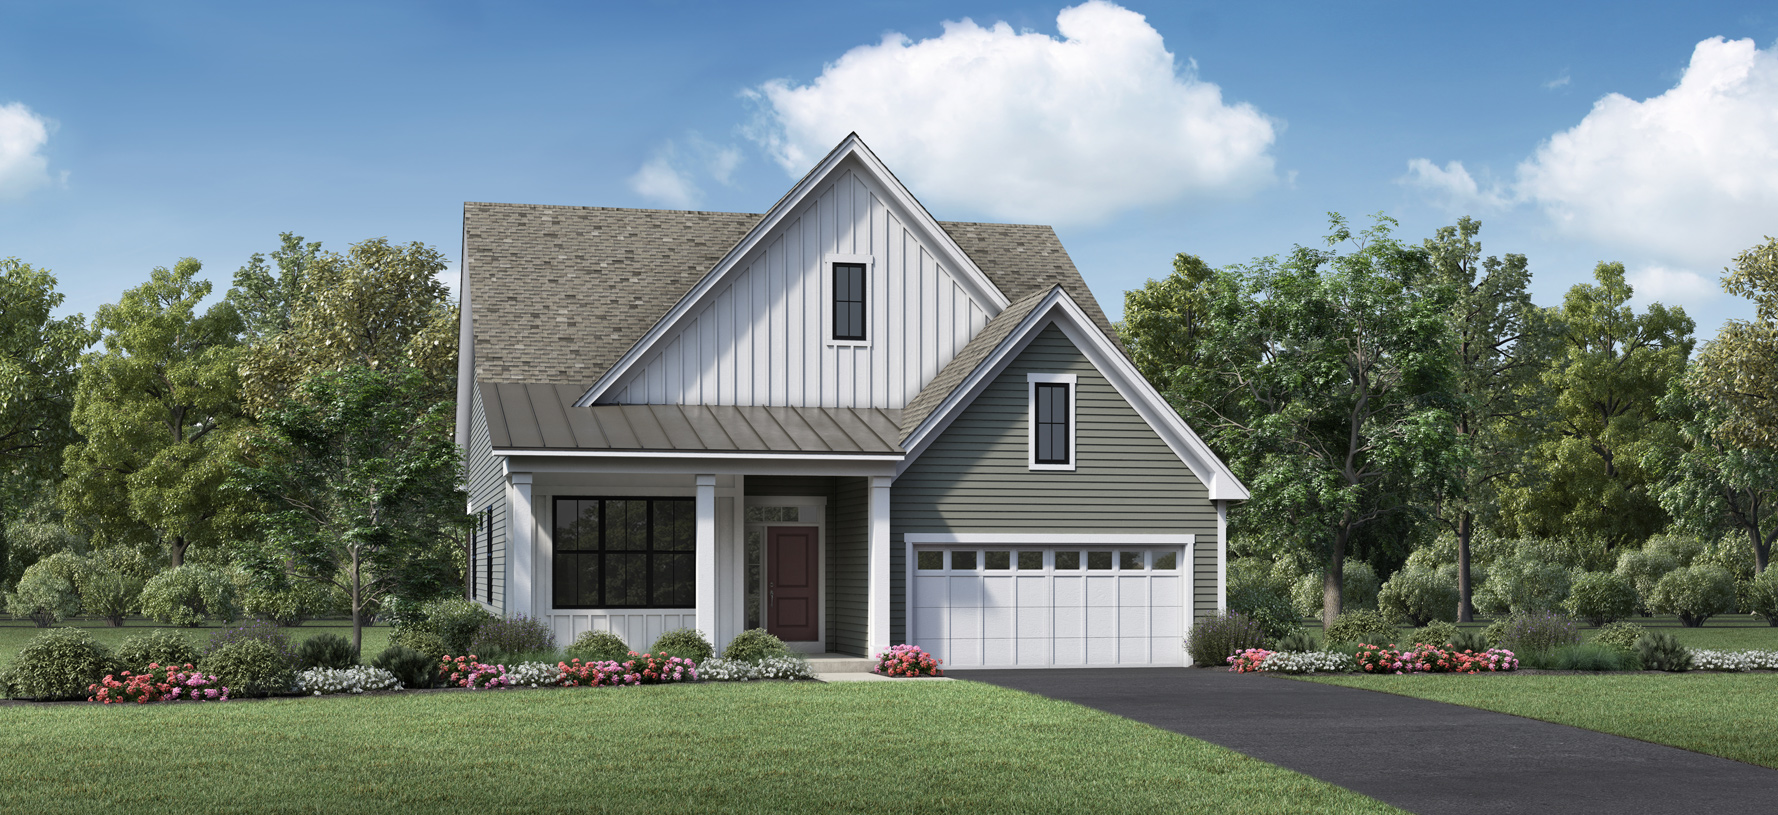 Livingston -  Modern Farmhouse